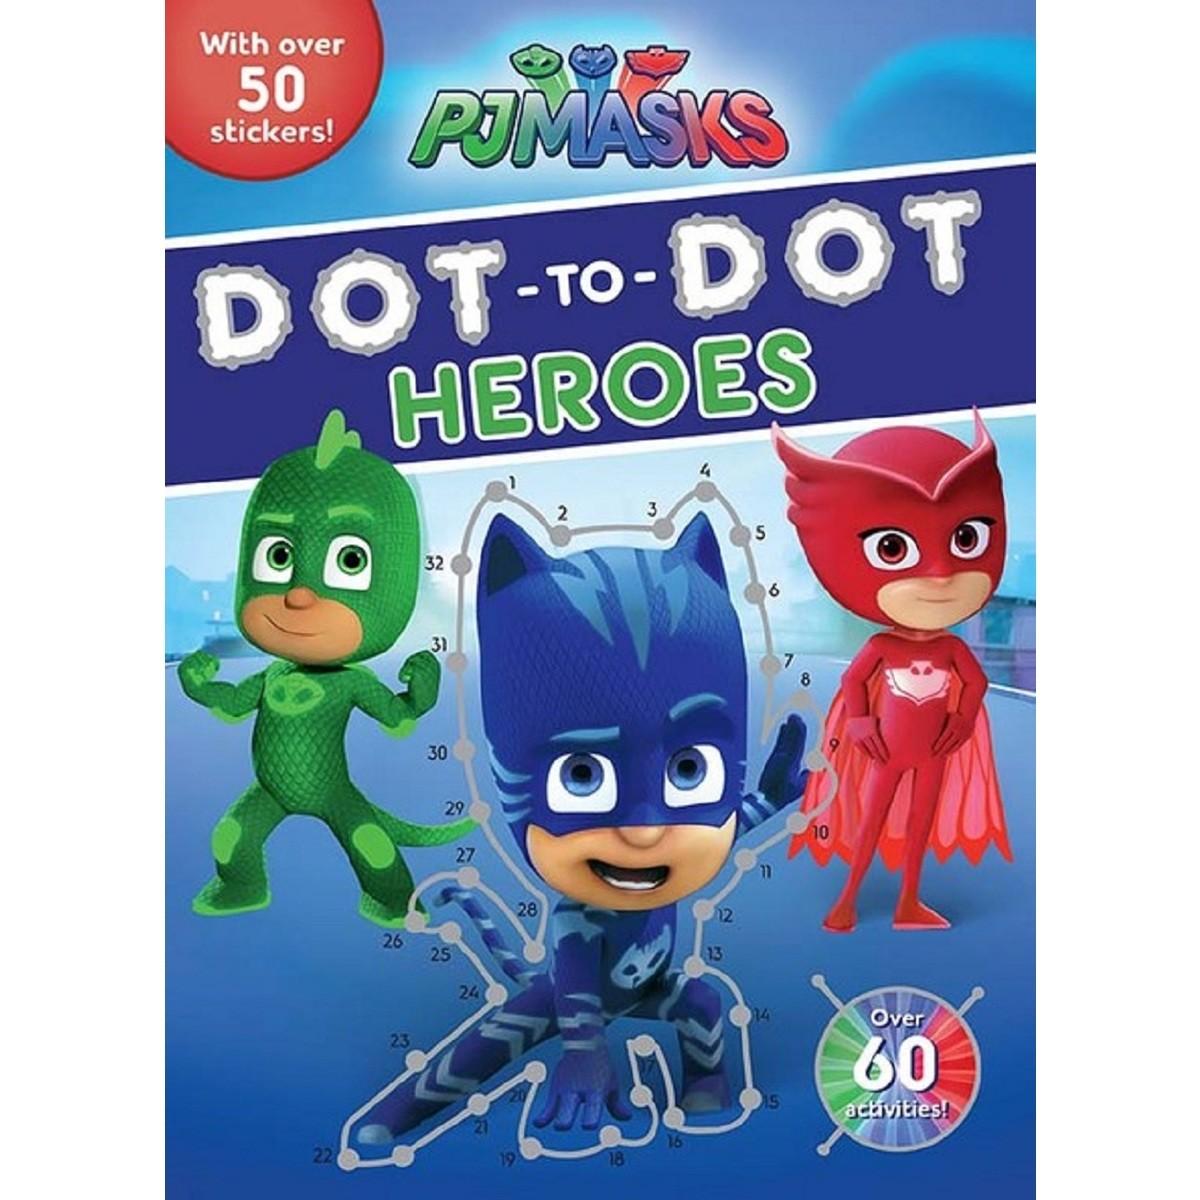 Pj Masks Dot To Dot Heroes